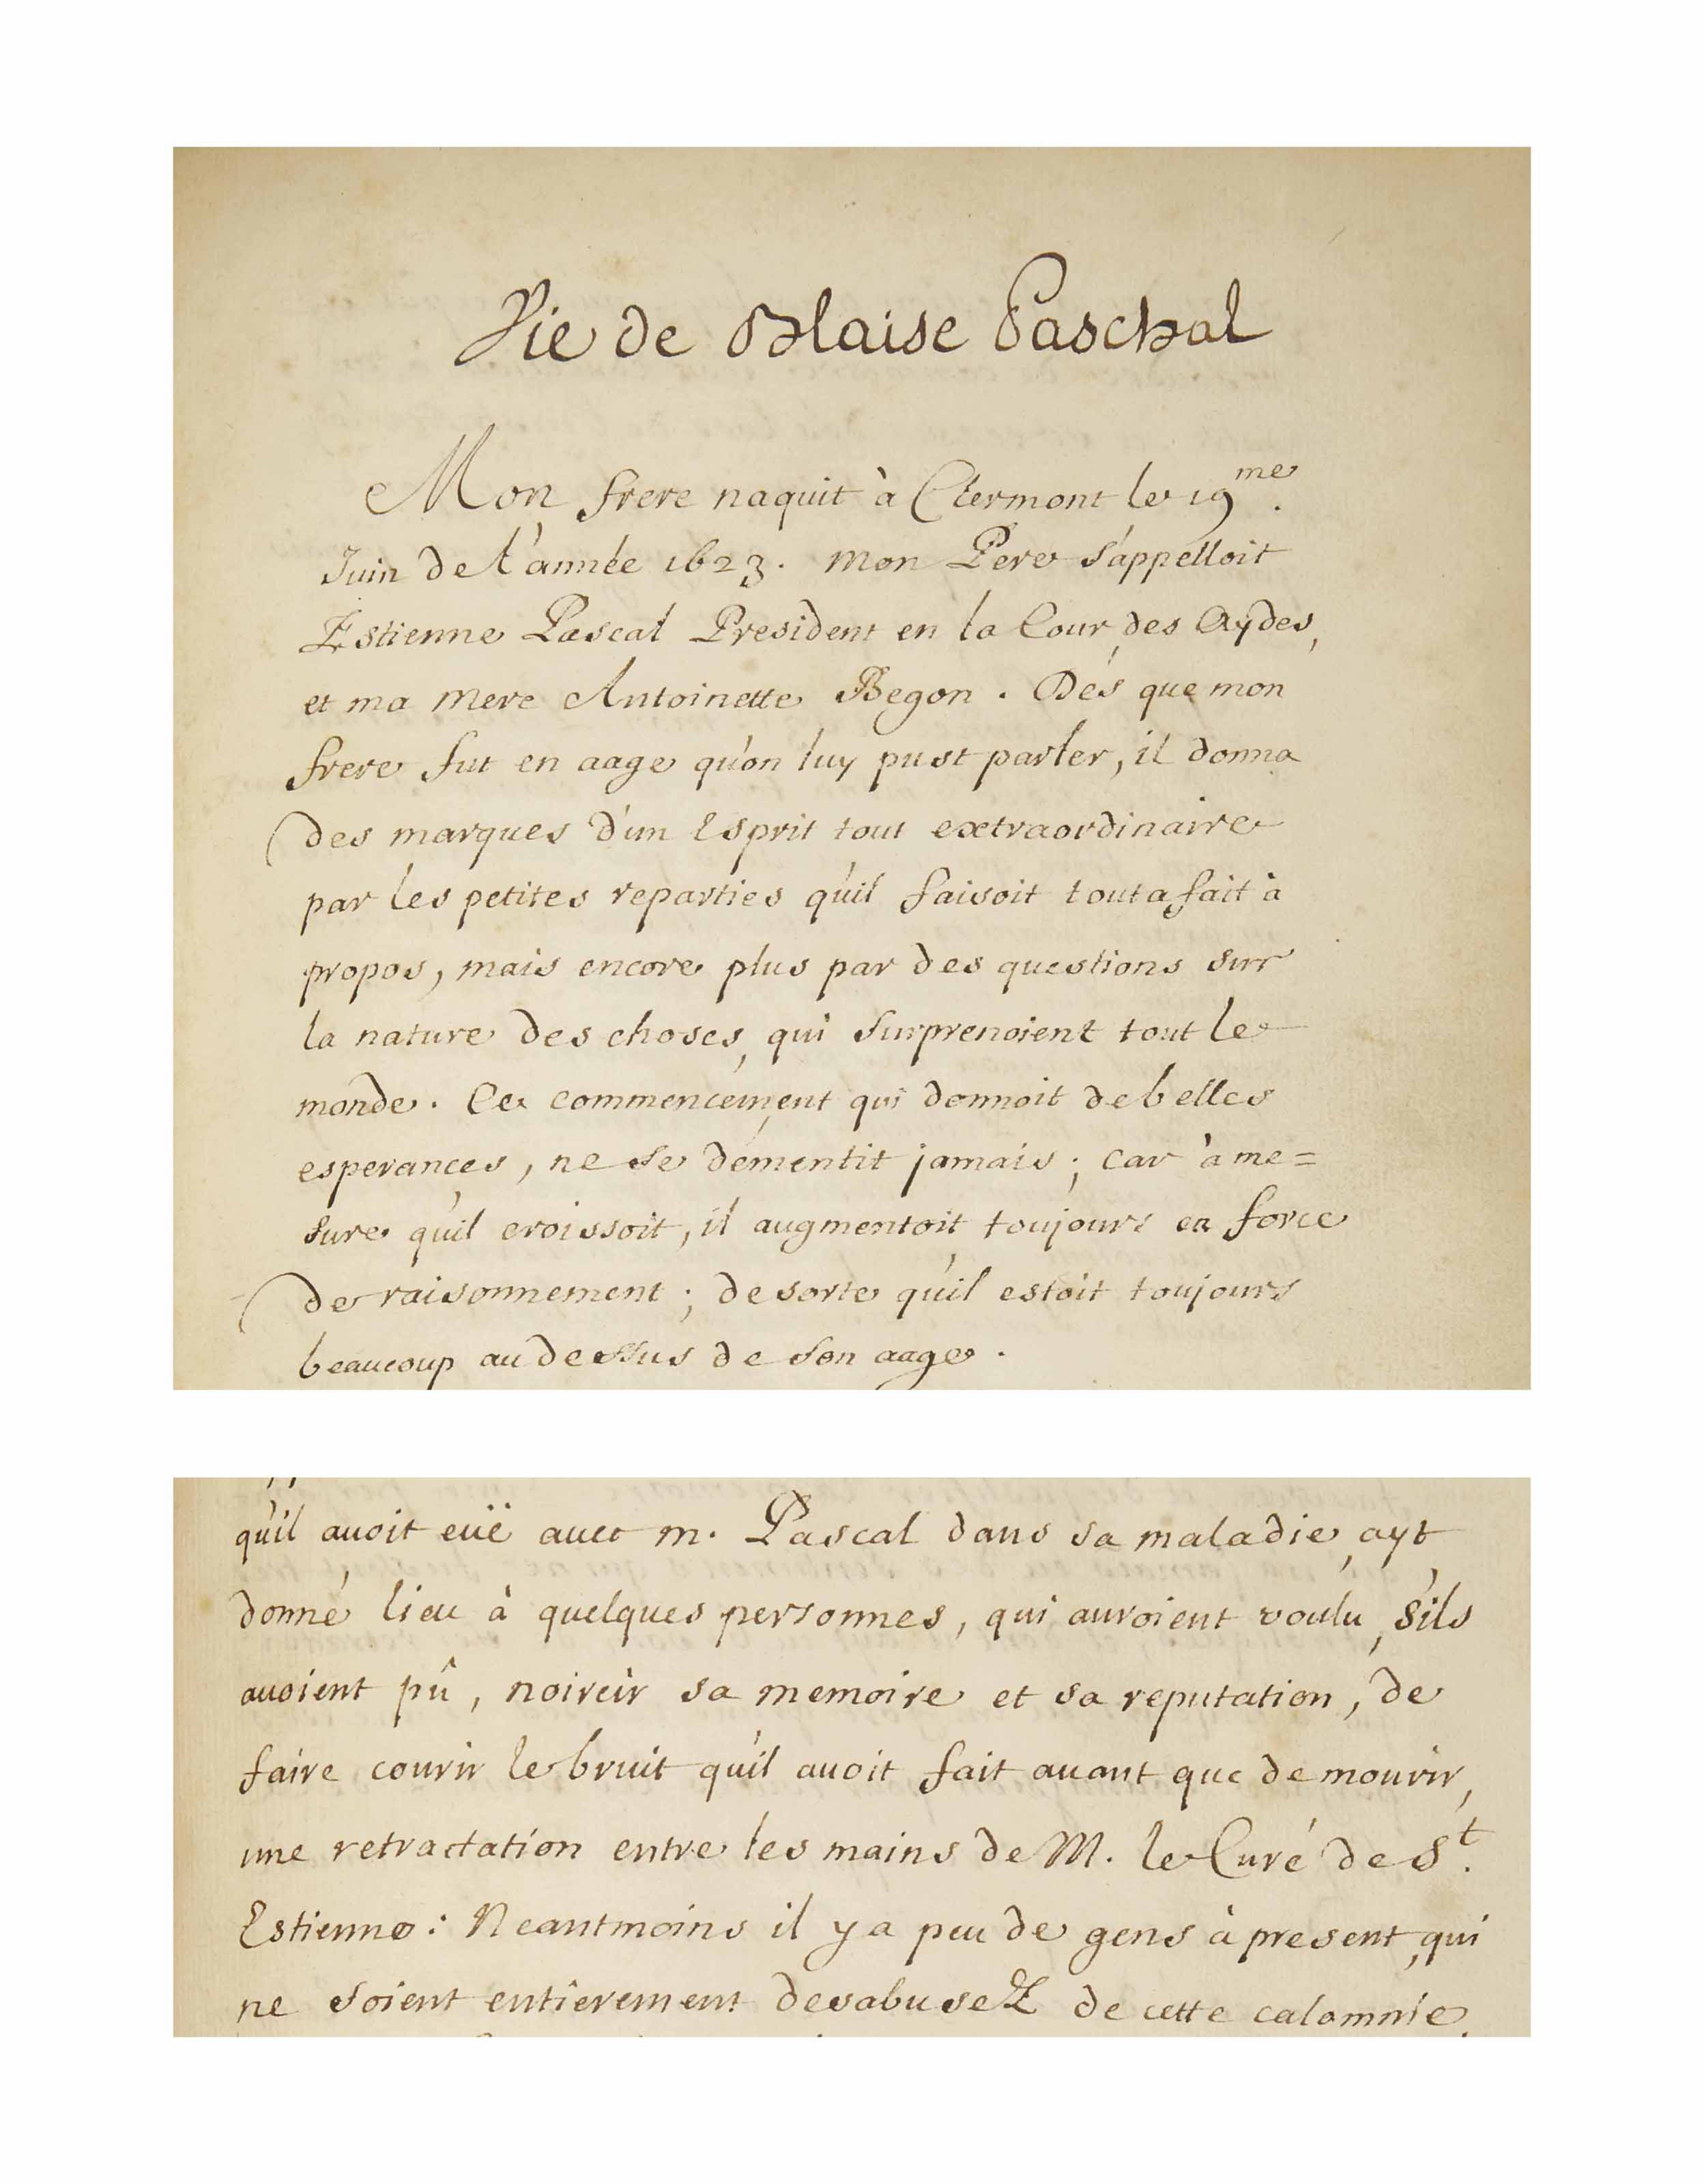 Blaise Pascal 1623 1662 Gilberte Perier 1620 1687 Vie De Blaise Paschal Suivi De